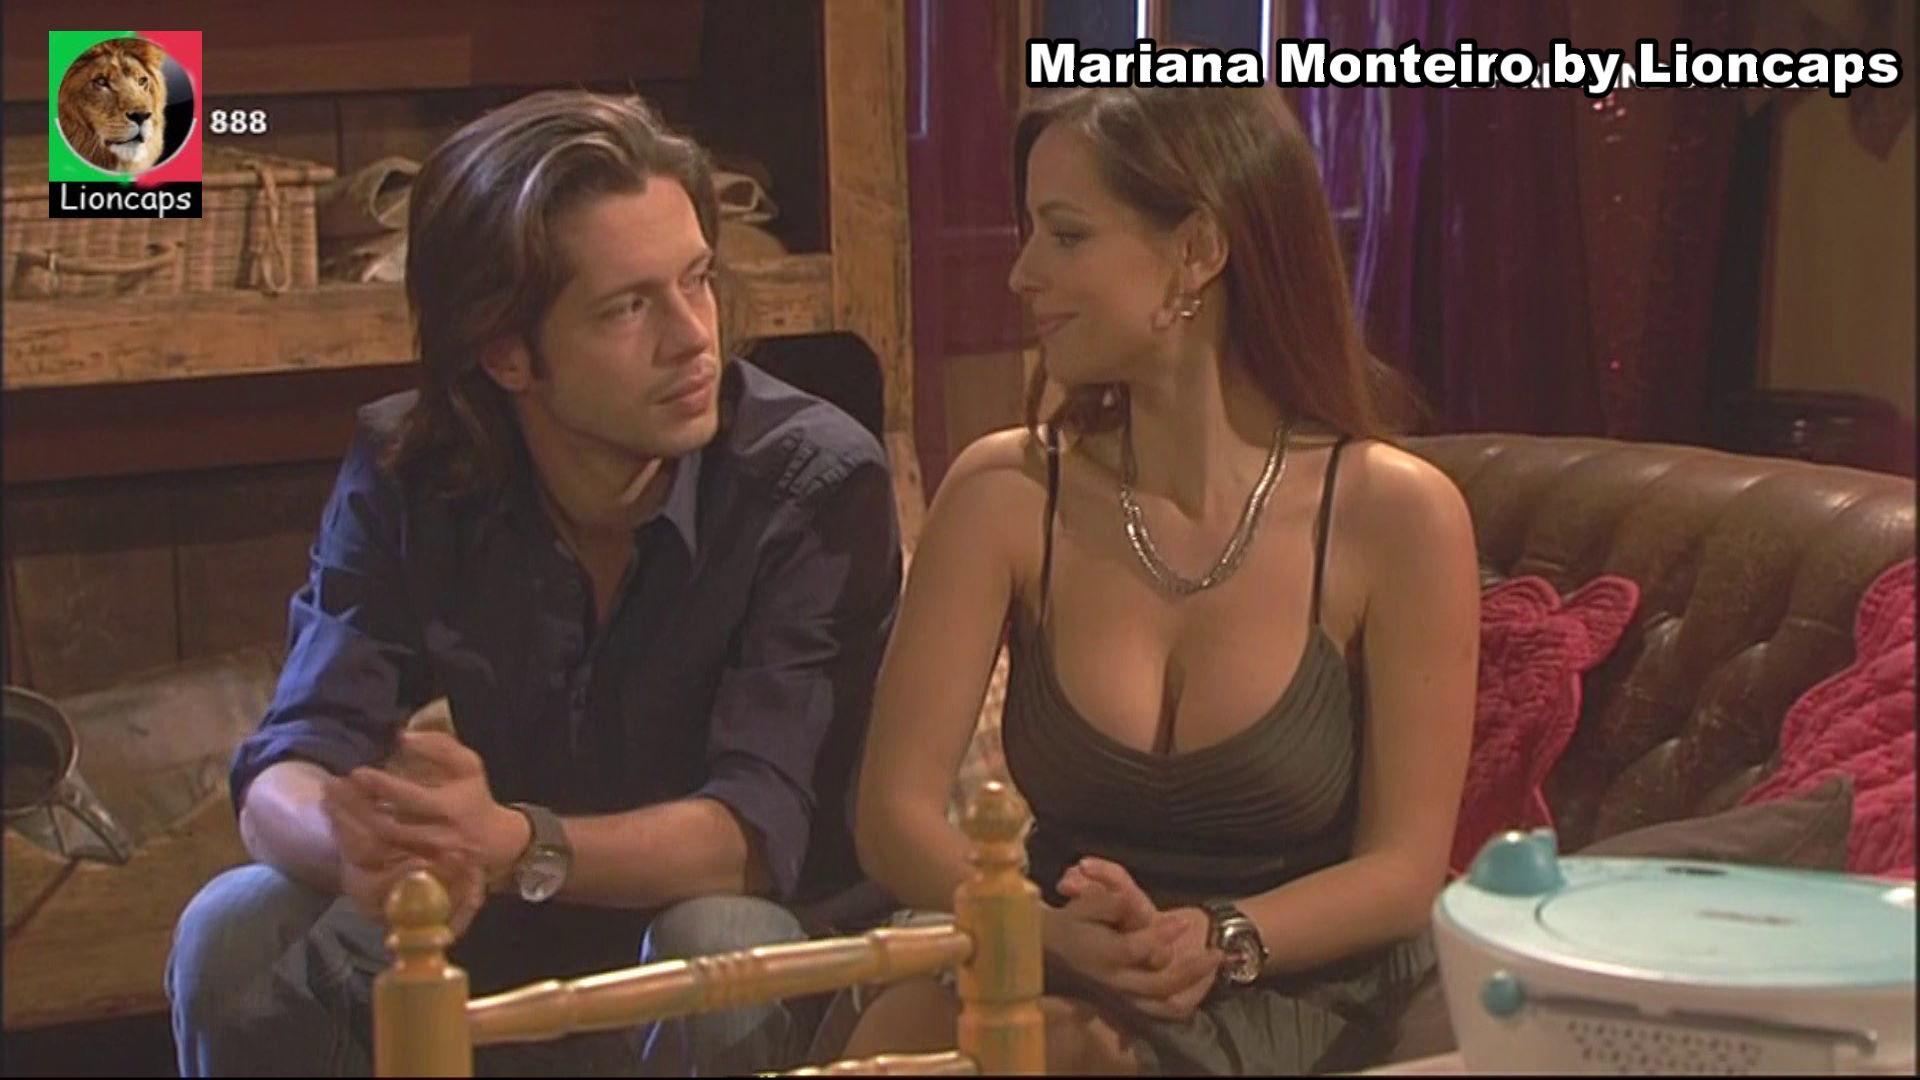 738385723_mariana_monteiro_vs190209_19215_122_535lo.JPG